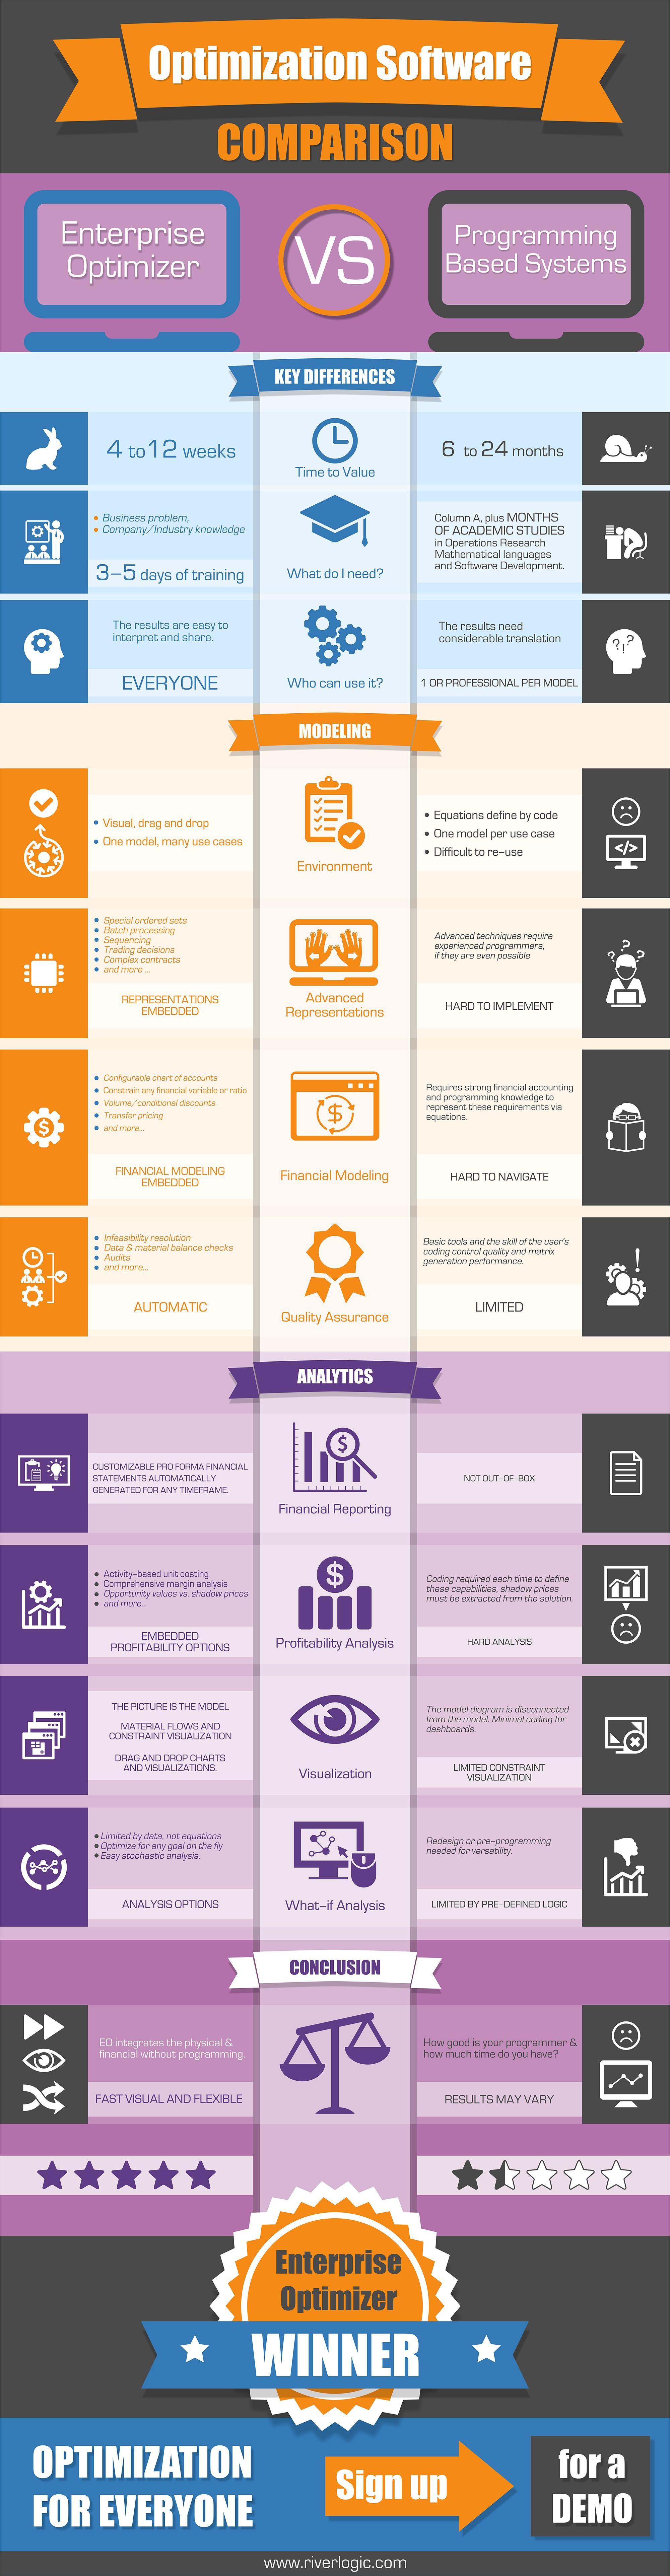 Comparison of Optimization Software Infographic